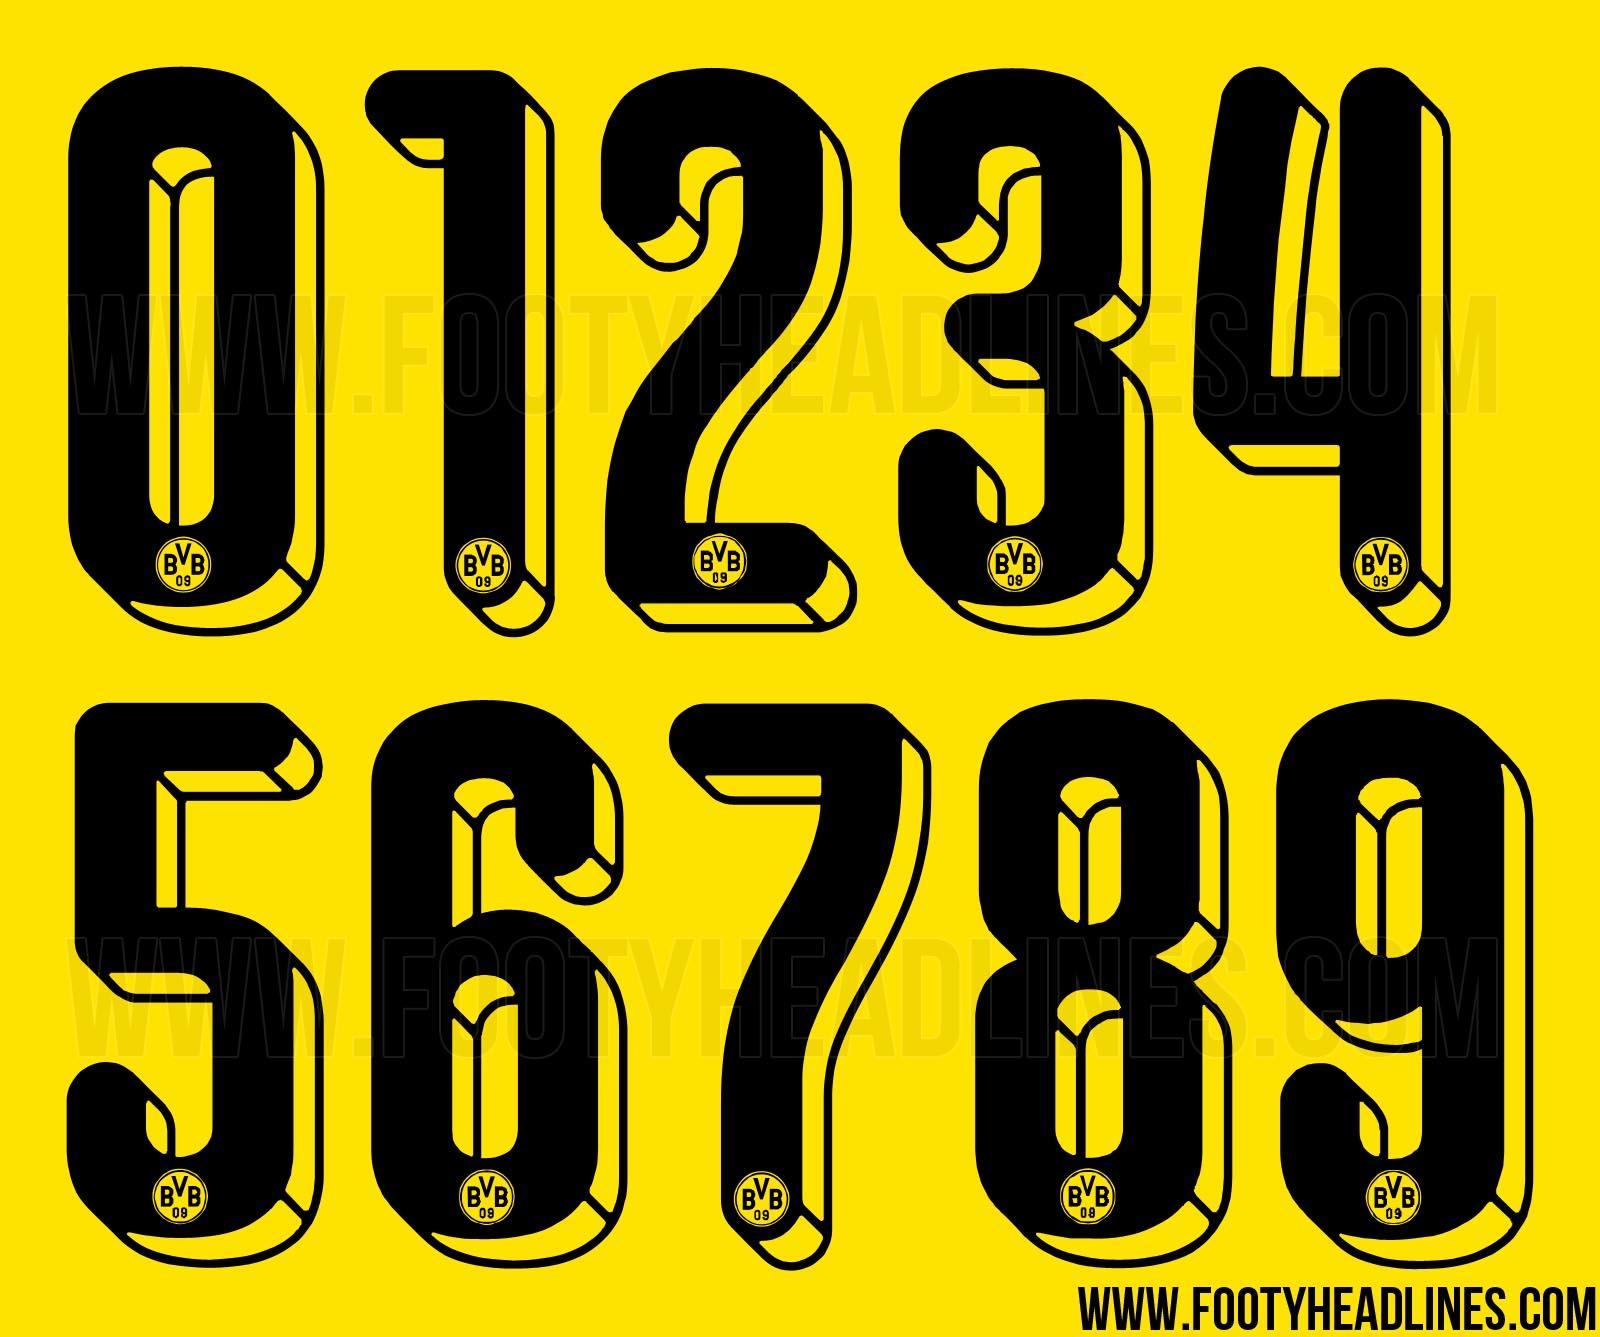 new borussia dortmund 15 16 kit font revealed footy headlines